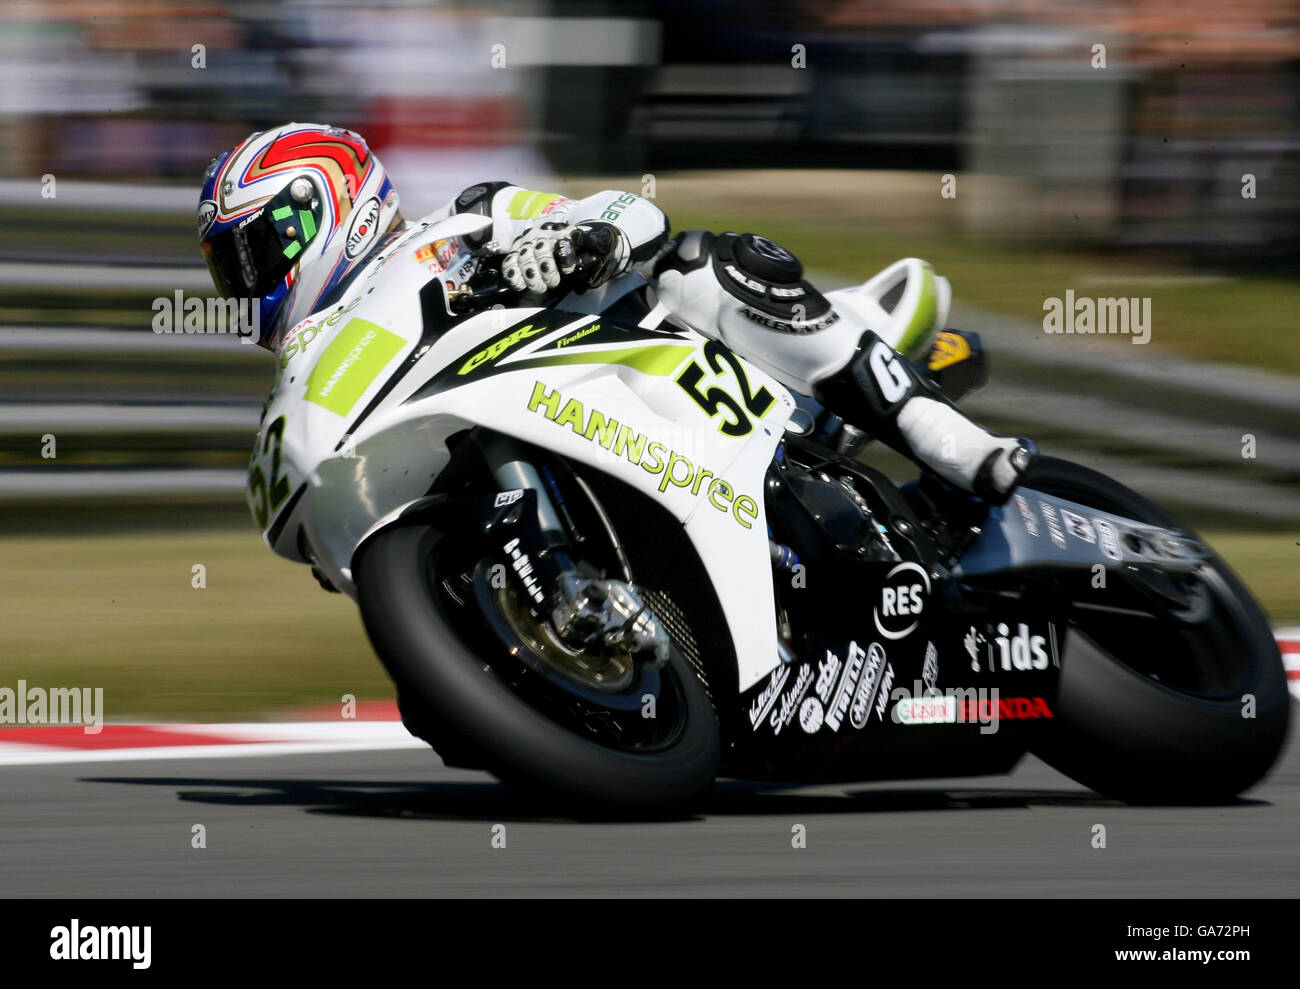 2007 Superbike World Championship